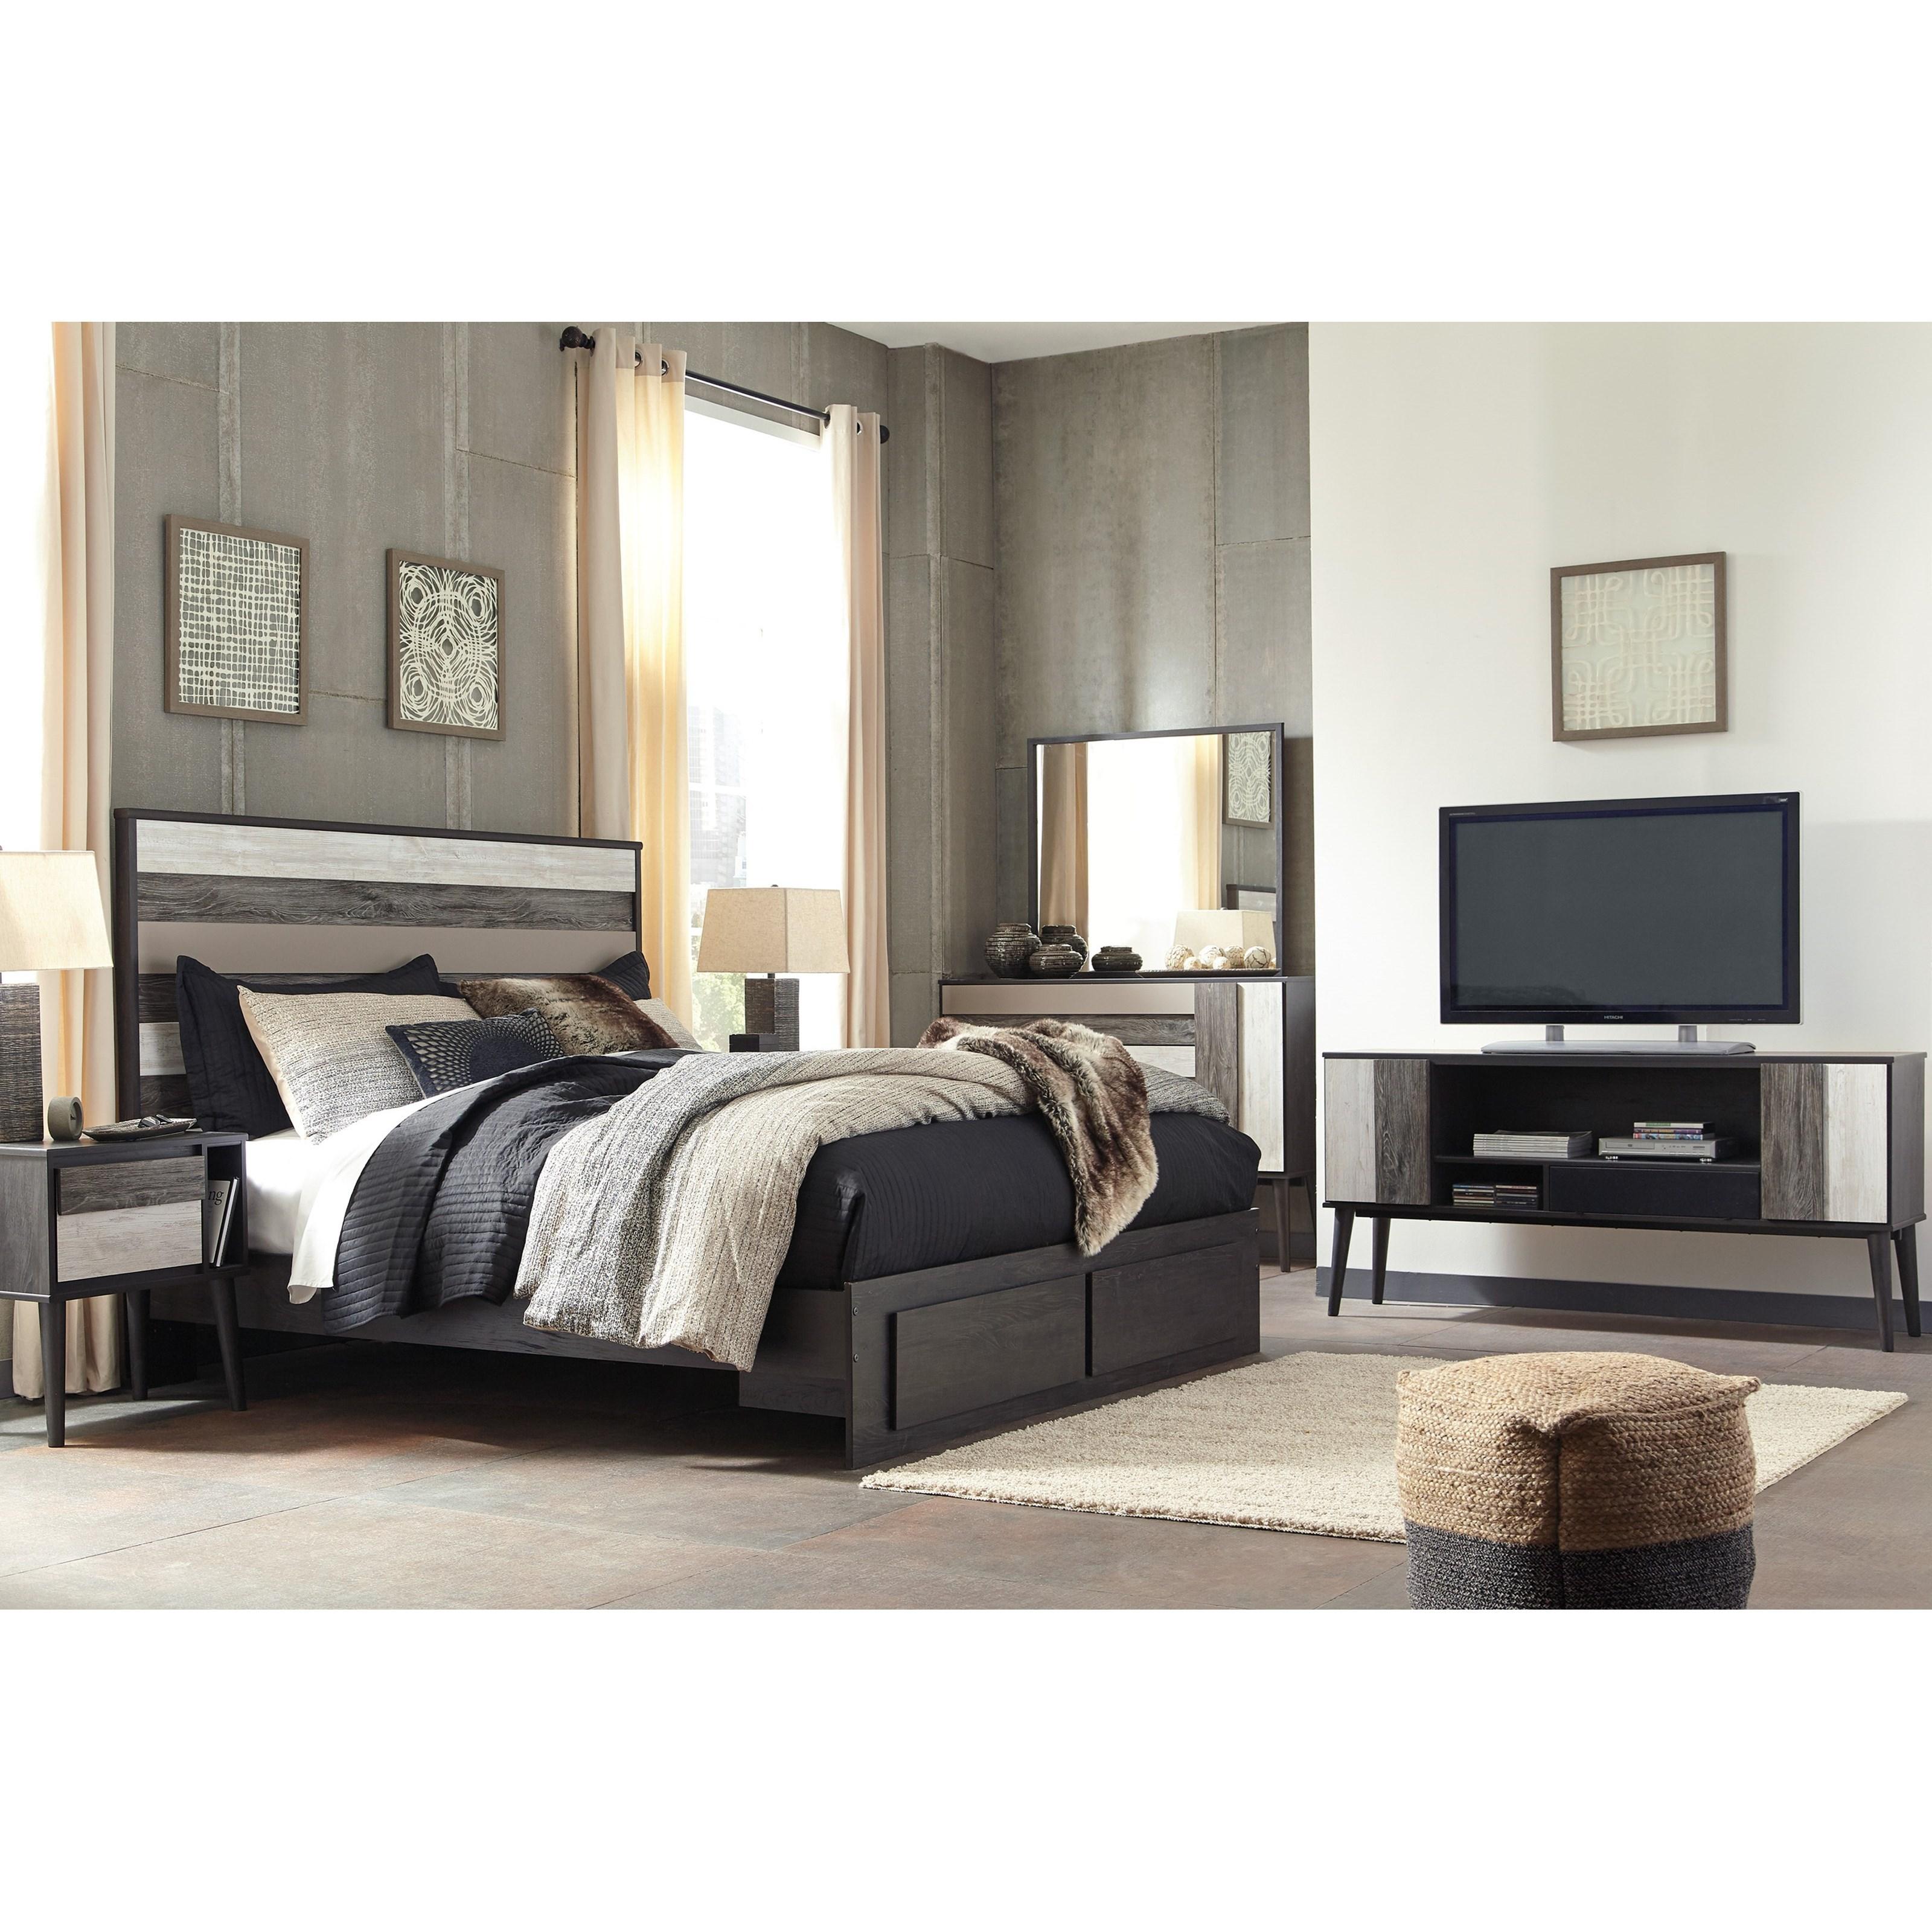 Signature Design by Ashley Micco King Bedroom Group - Item Number: B300 K Bedroom Group 1